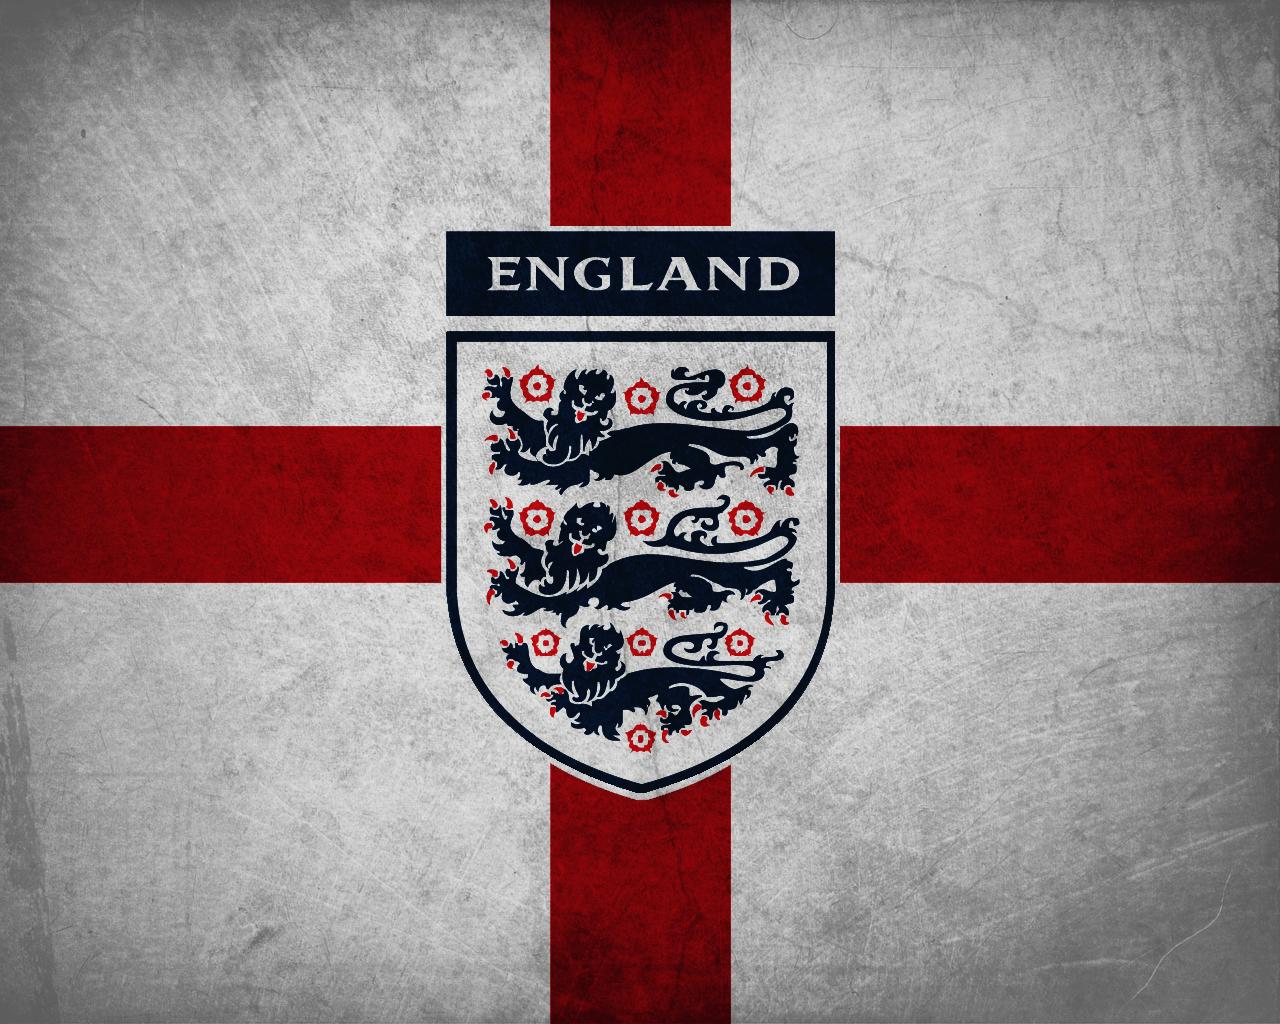 England Flag Wallpaper - WallpaperSafari